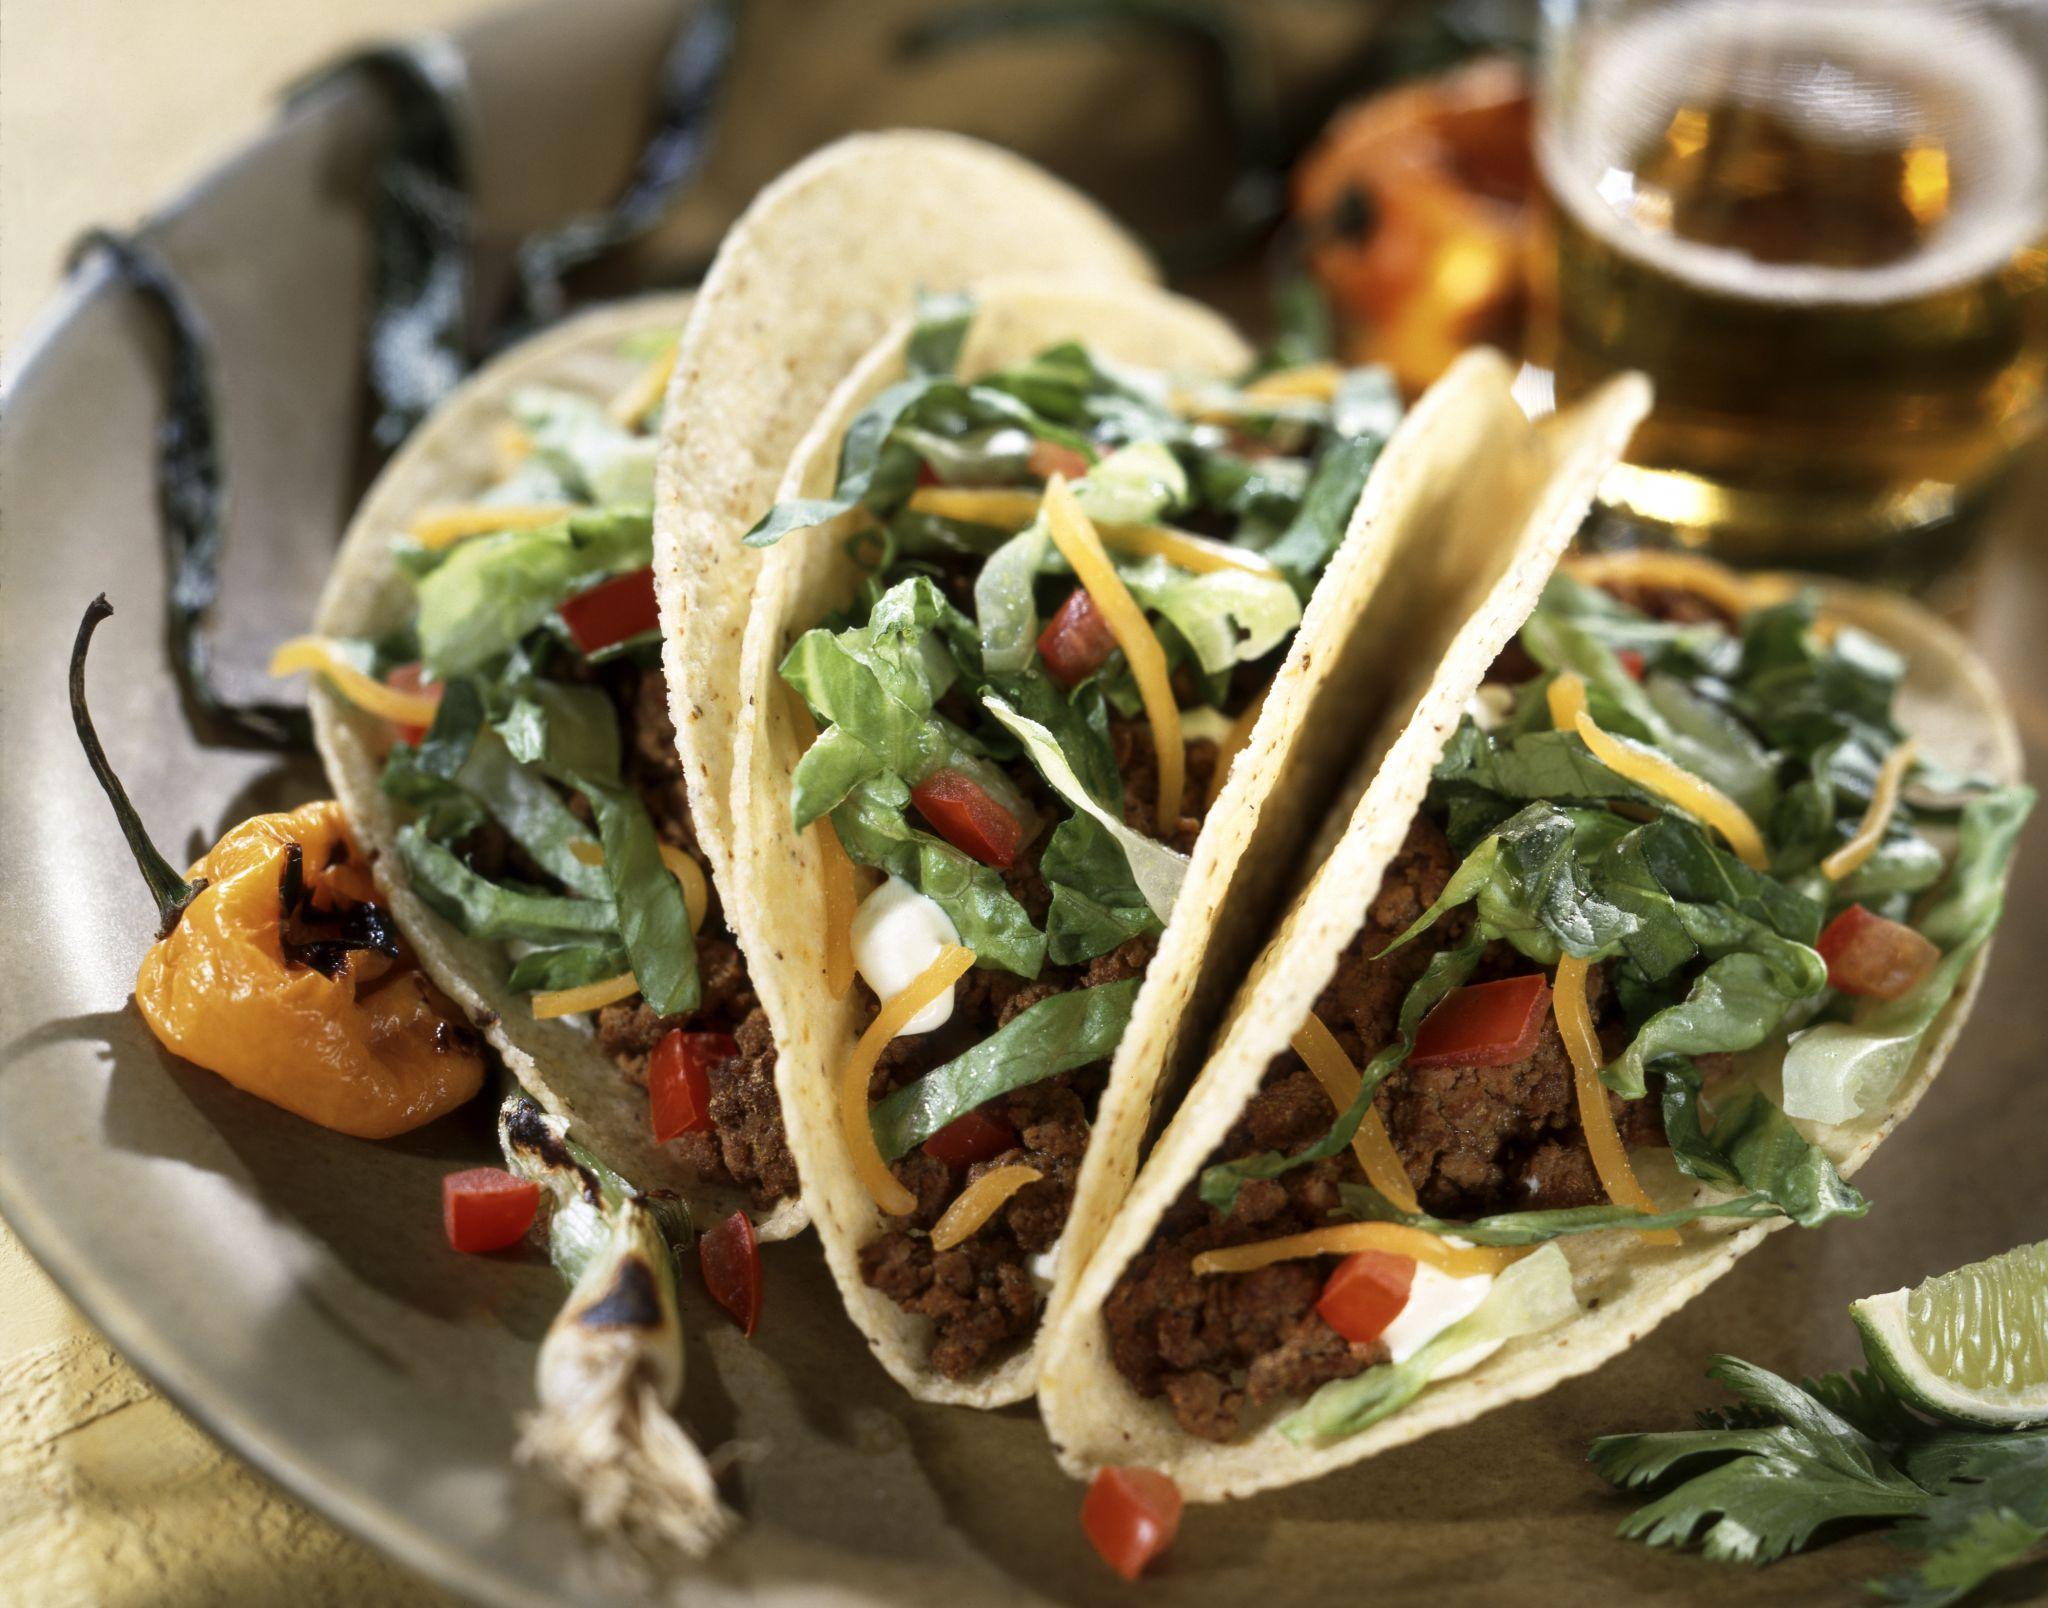 Live roaches, black substance in ice machine highlight Houston restaurant violations (Nov. 11-17)